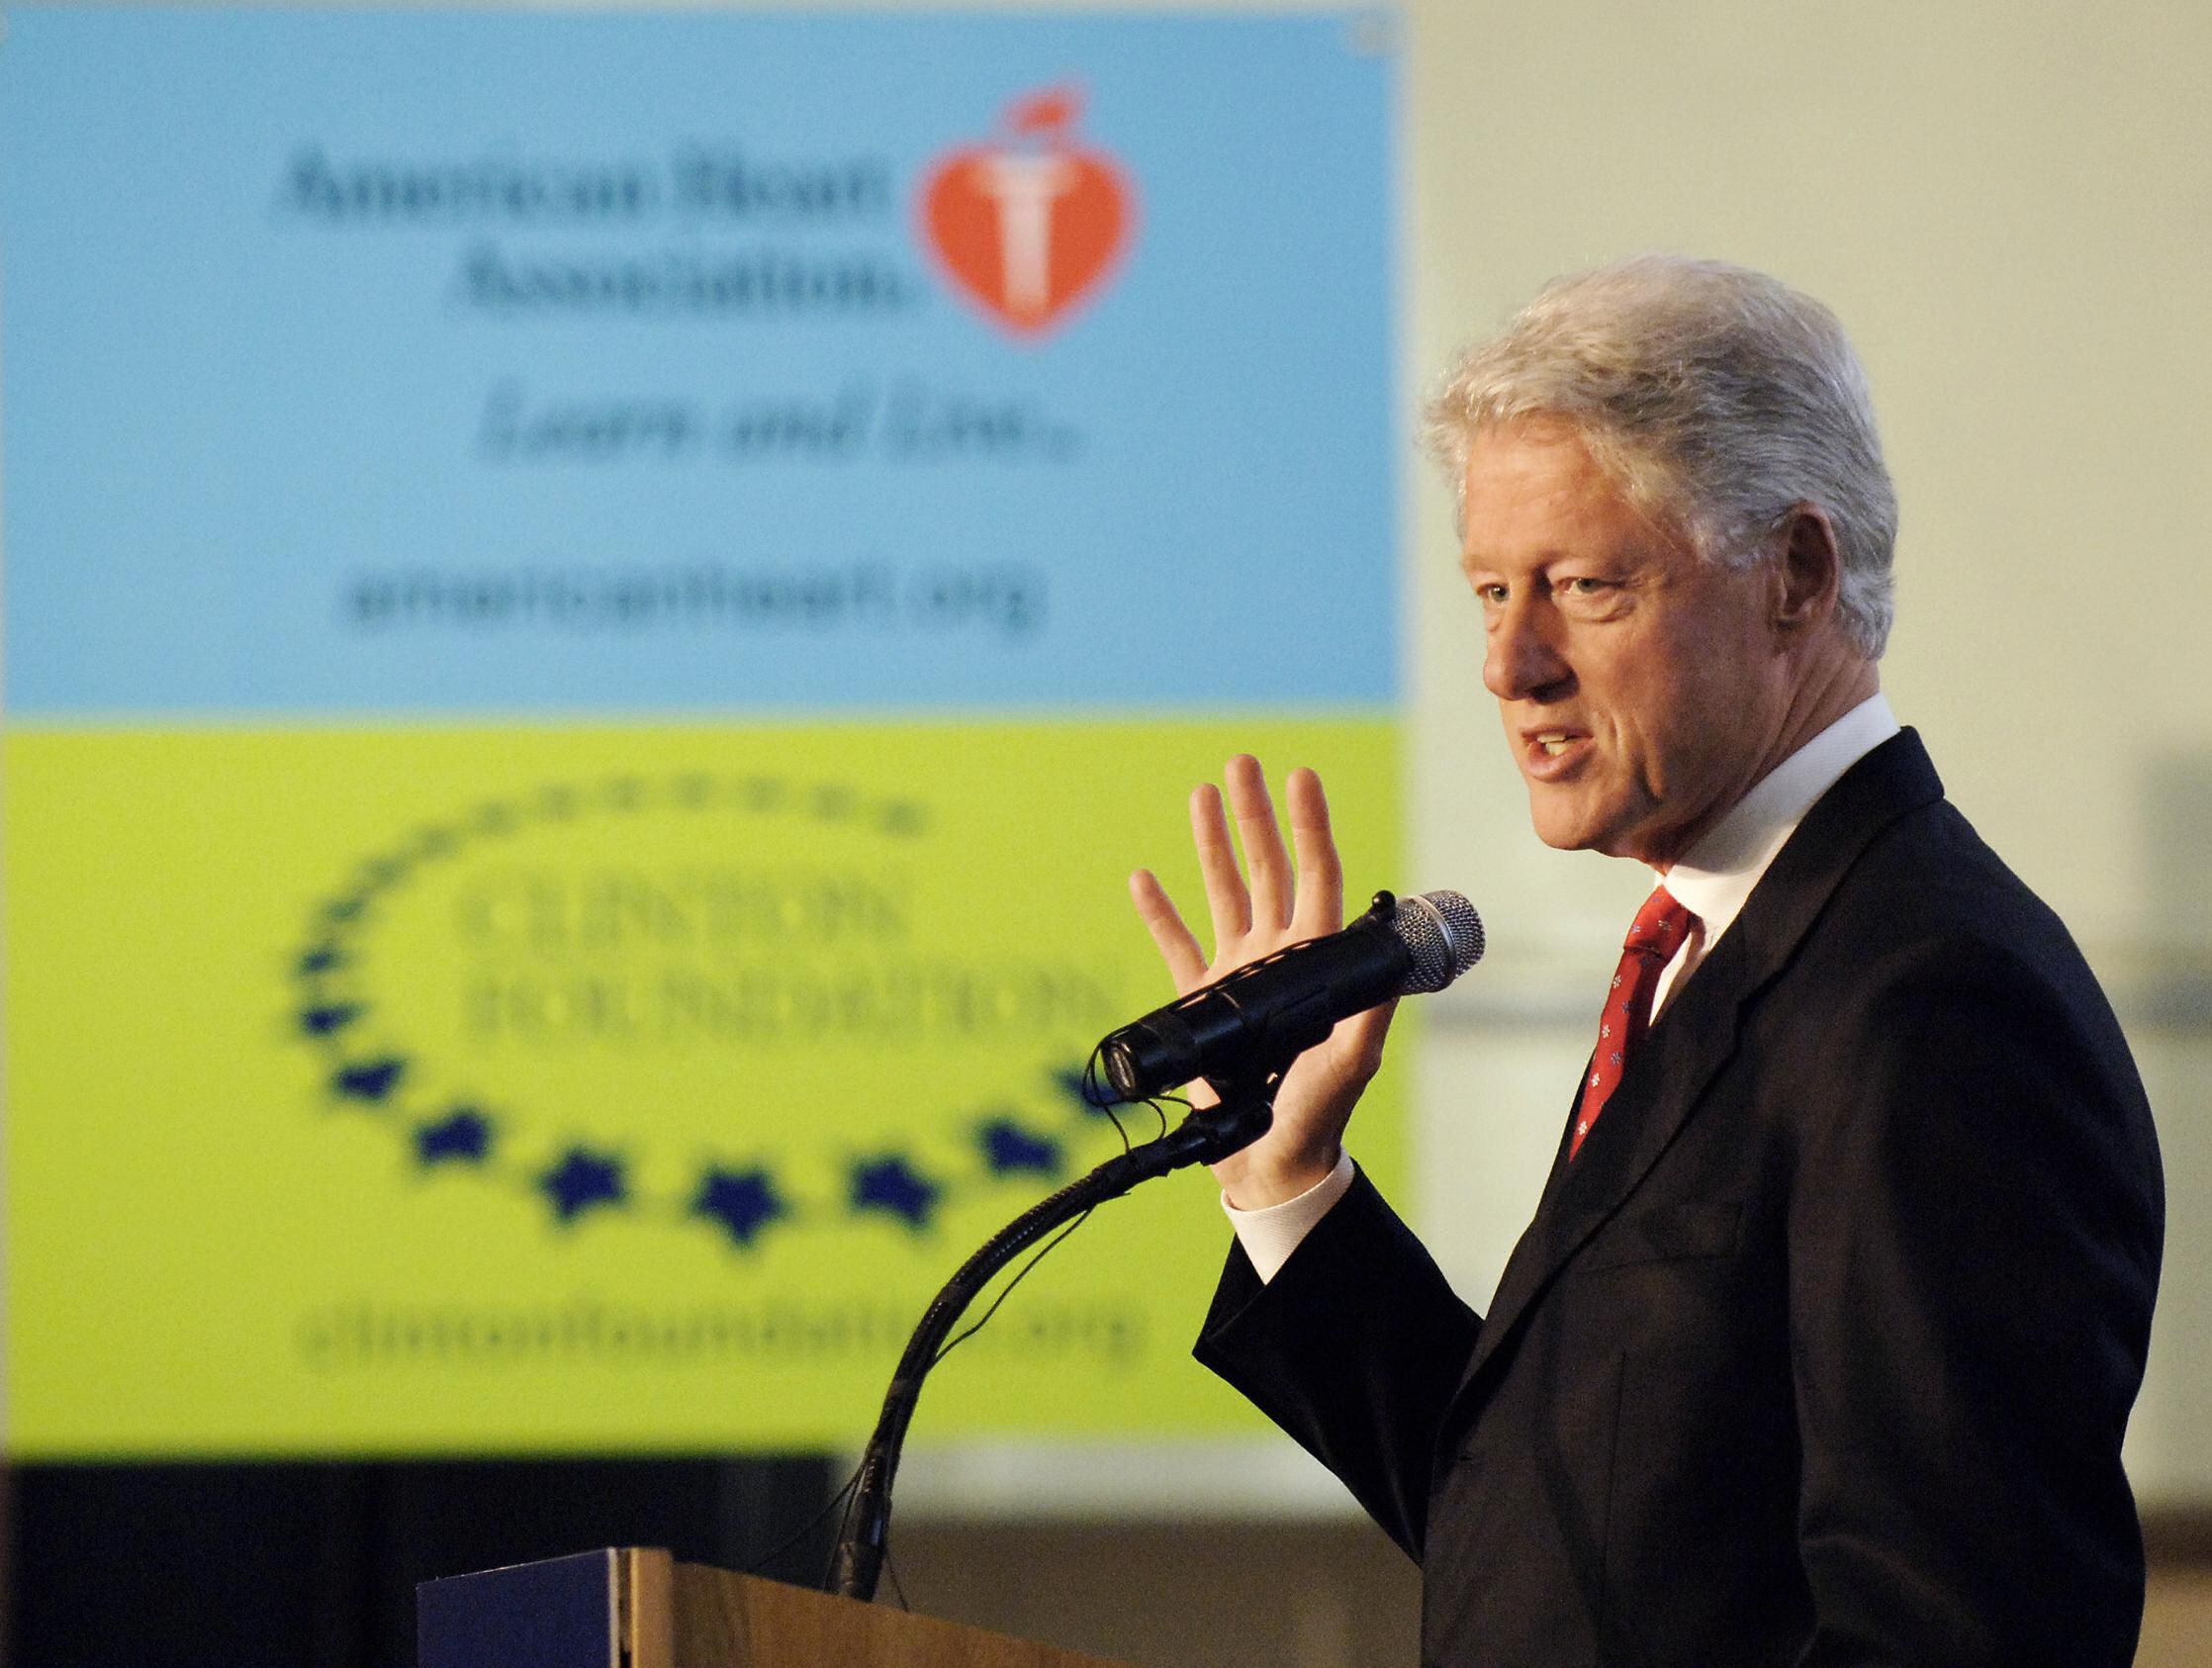 Former US President Bill Clinton speaks